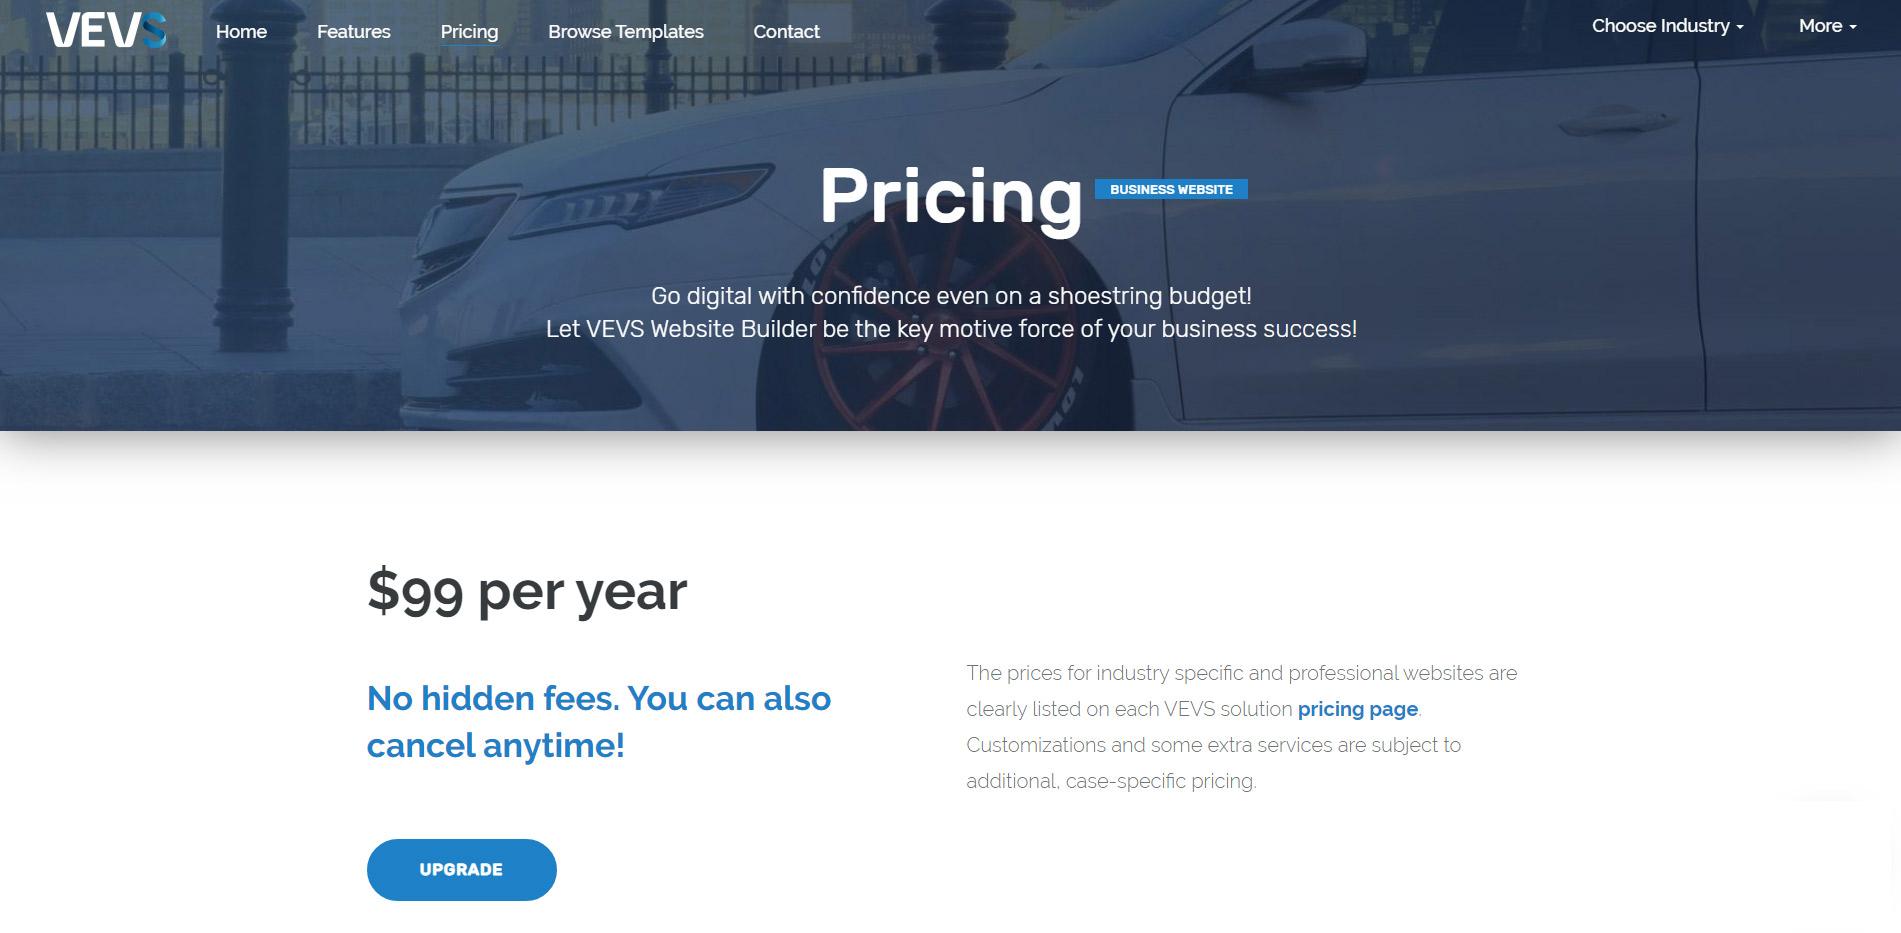 VEVS pricing